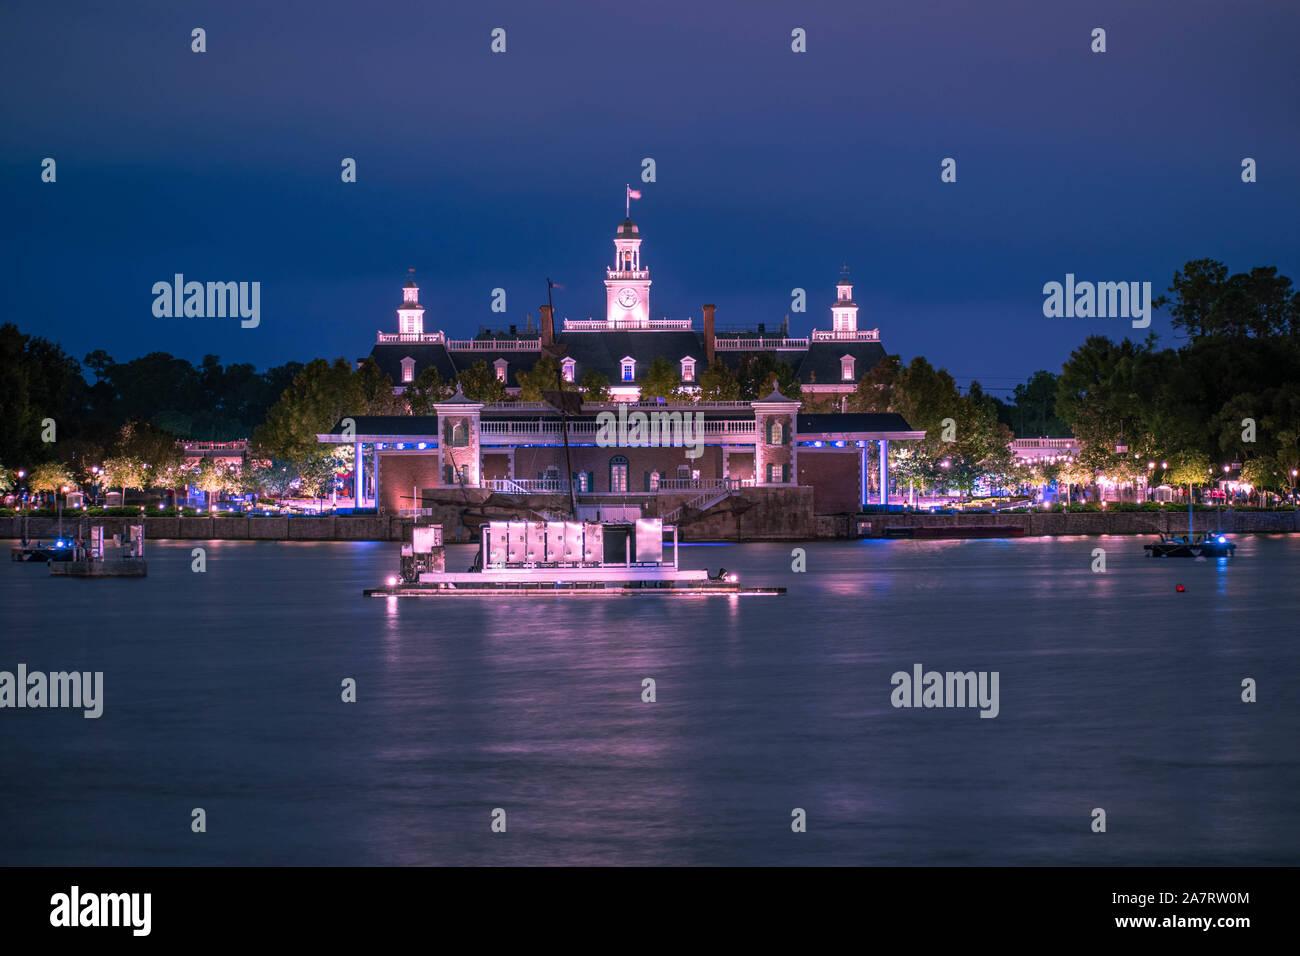 Orlando, Florida. Noviembre 01, 2019. La aventura de América sobre fondo azul noche Pavillion en Epcot® (5). Foto de stock